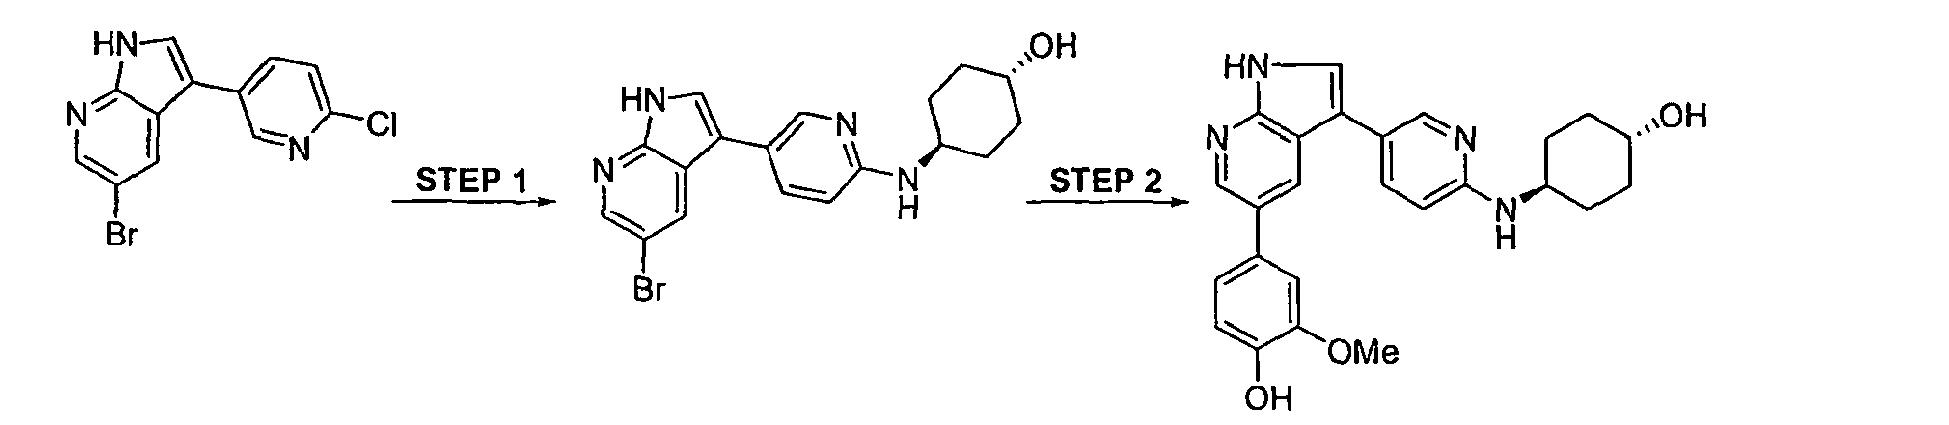 Figure imgb0455